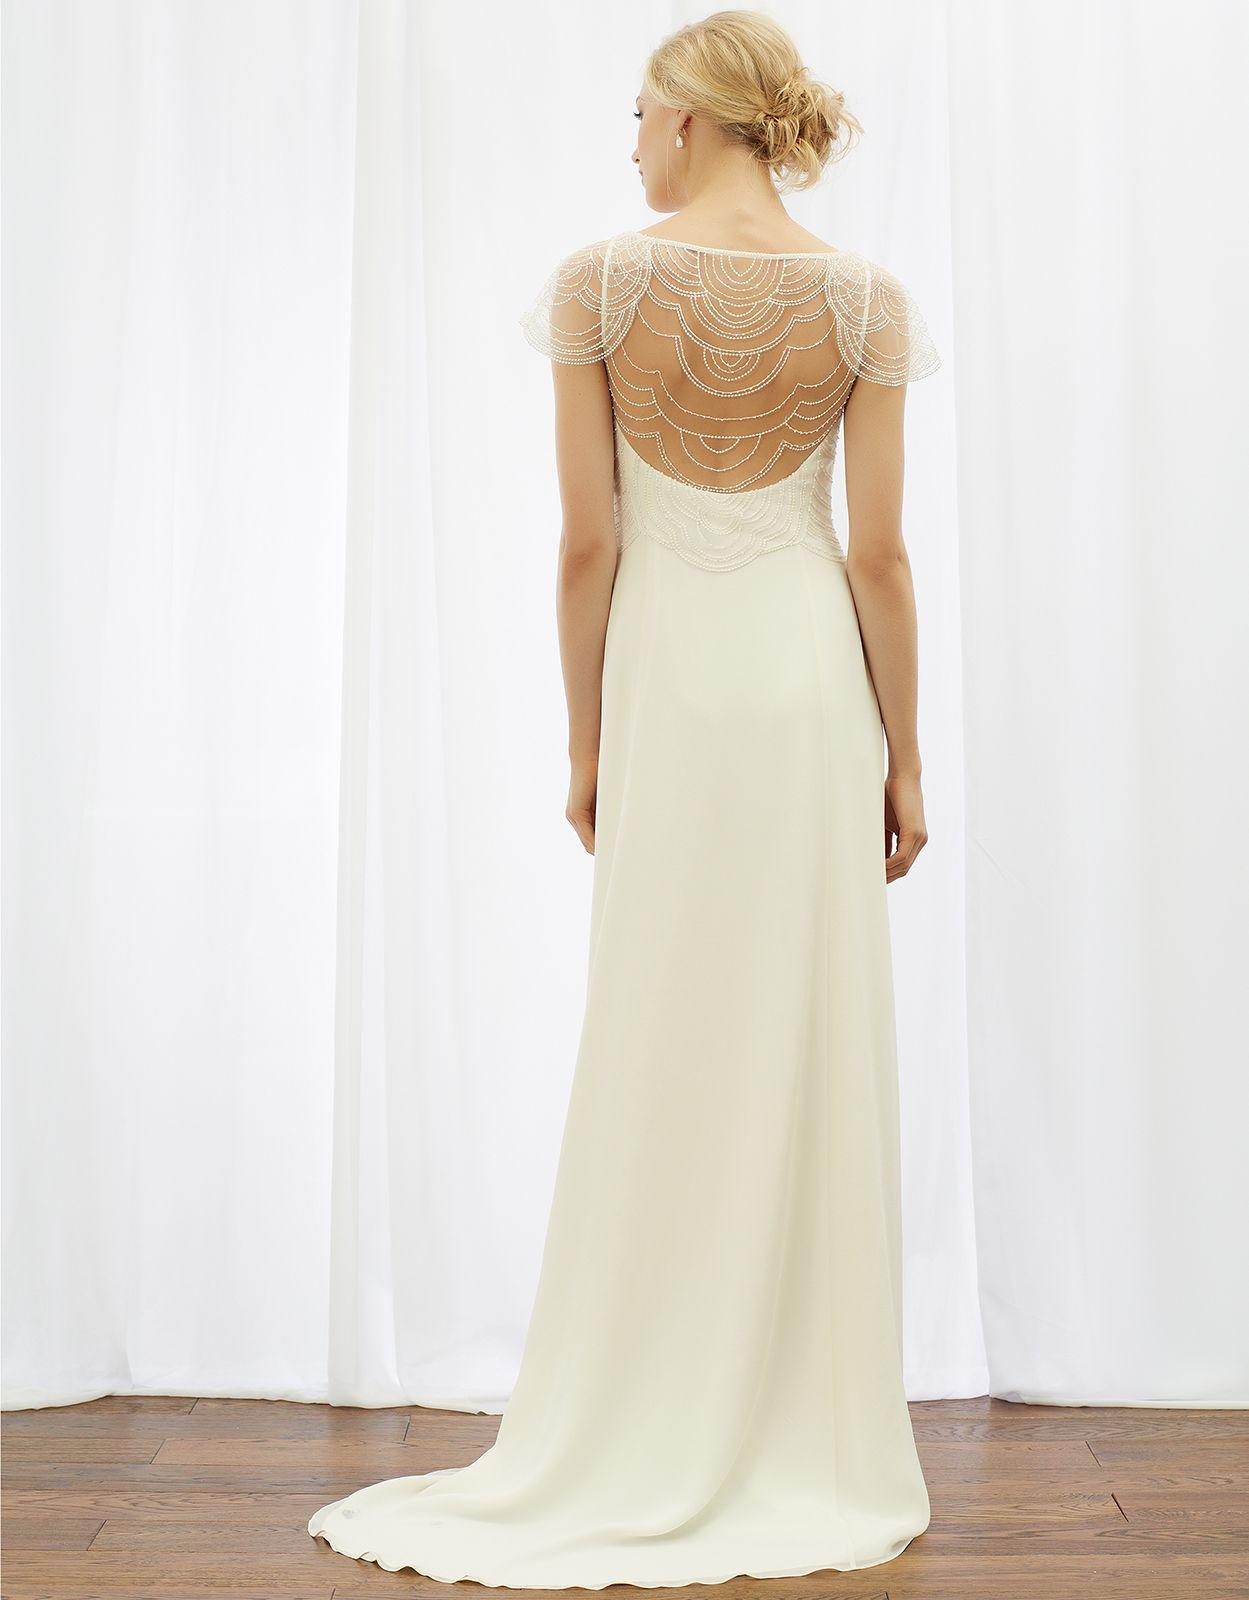 Marianne Bridal Dress Ivory Monsoon Sheer wedding